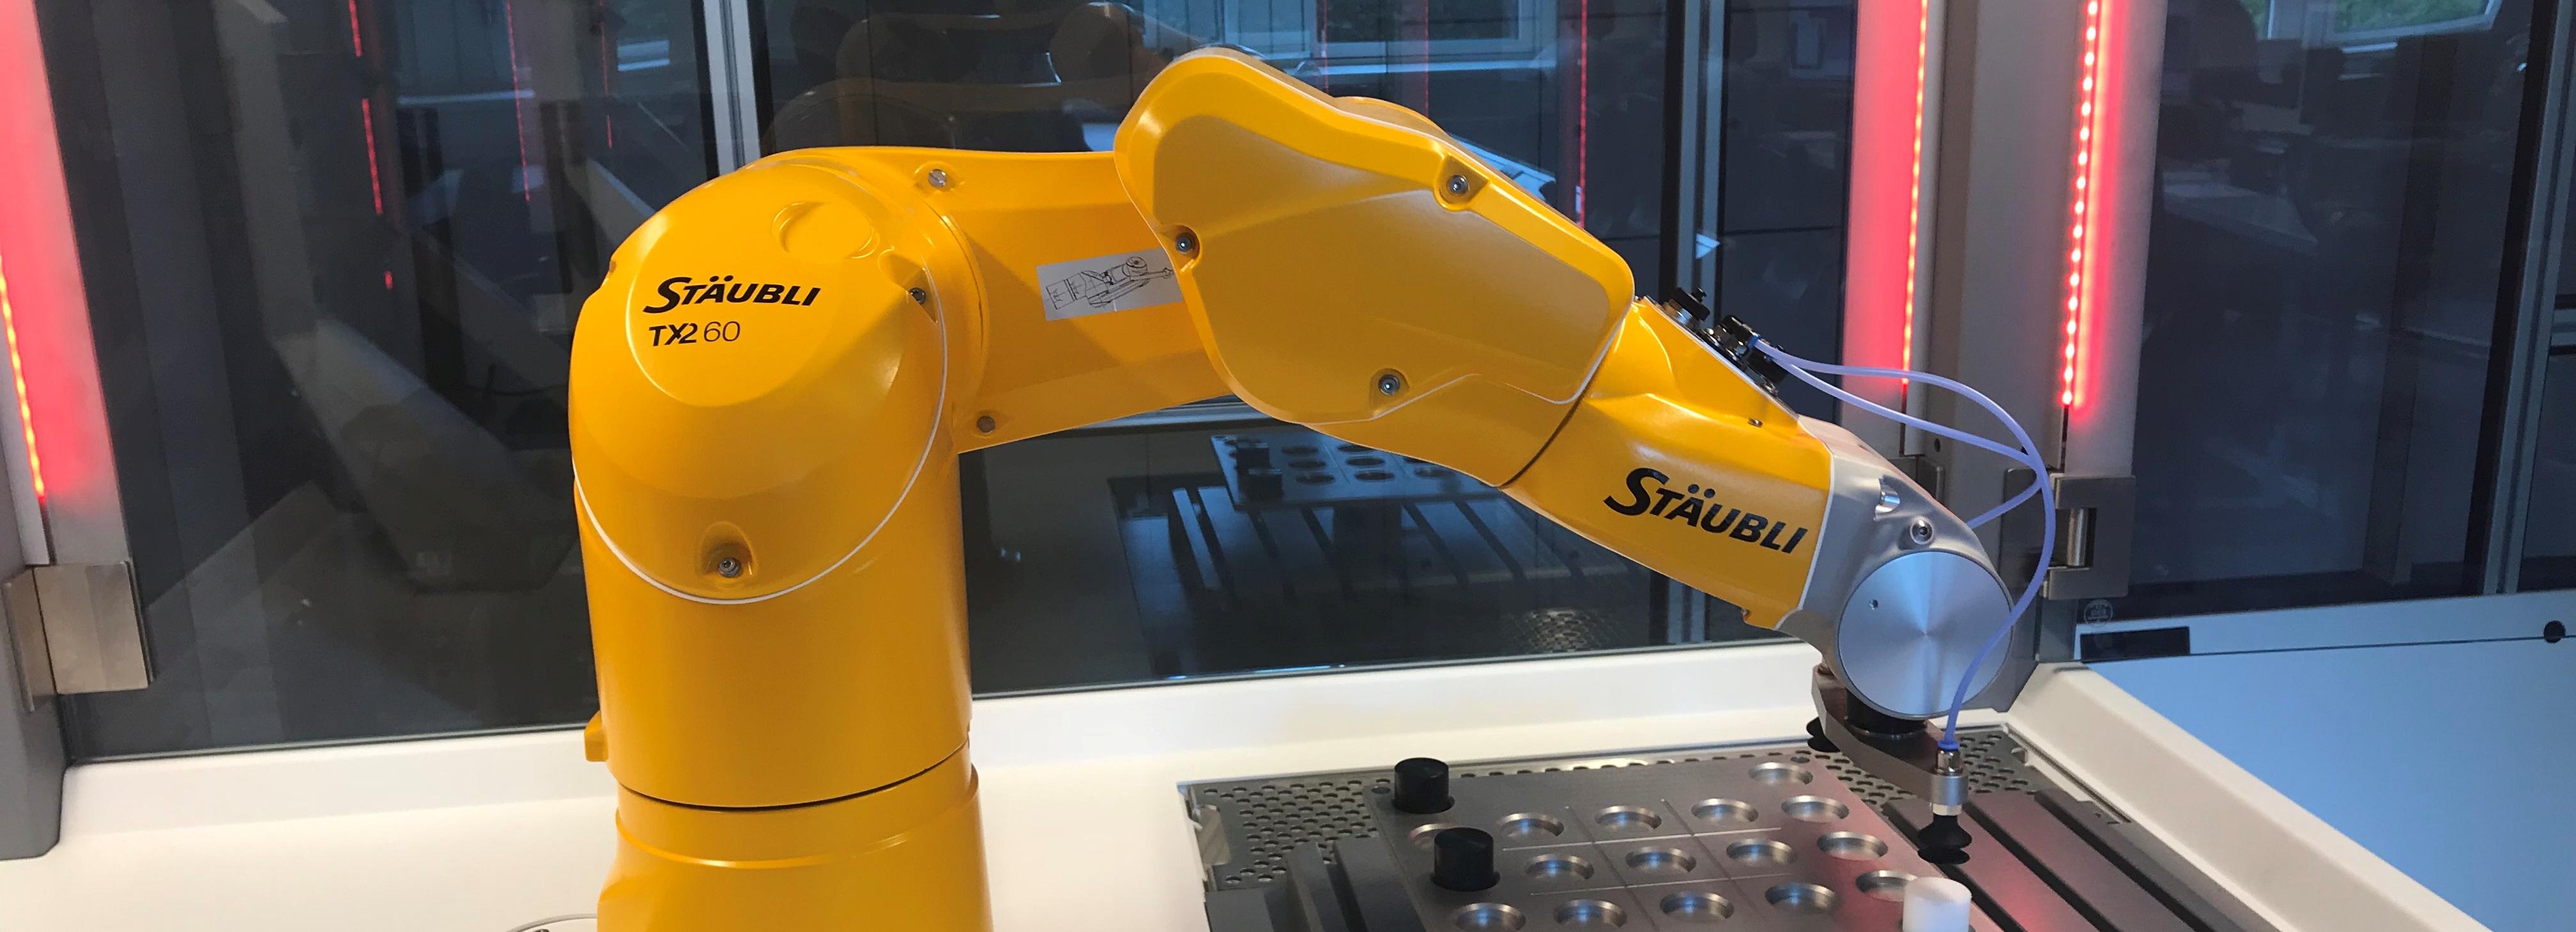 Geprüfter Industrieexperte Robotik